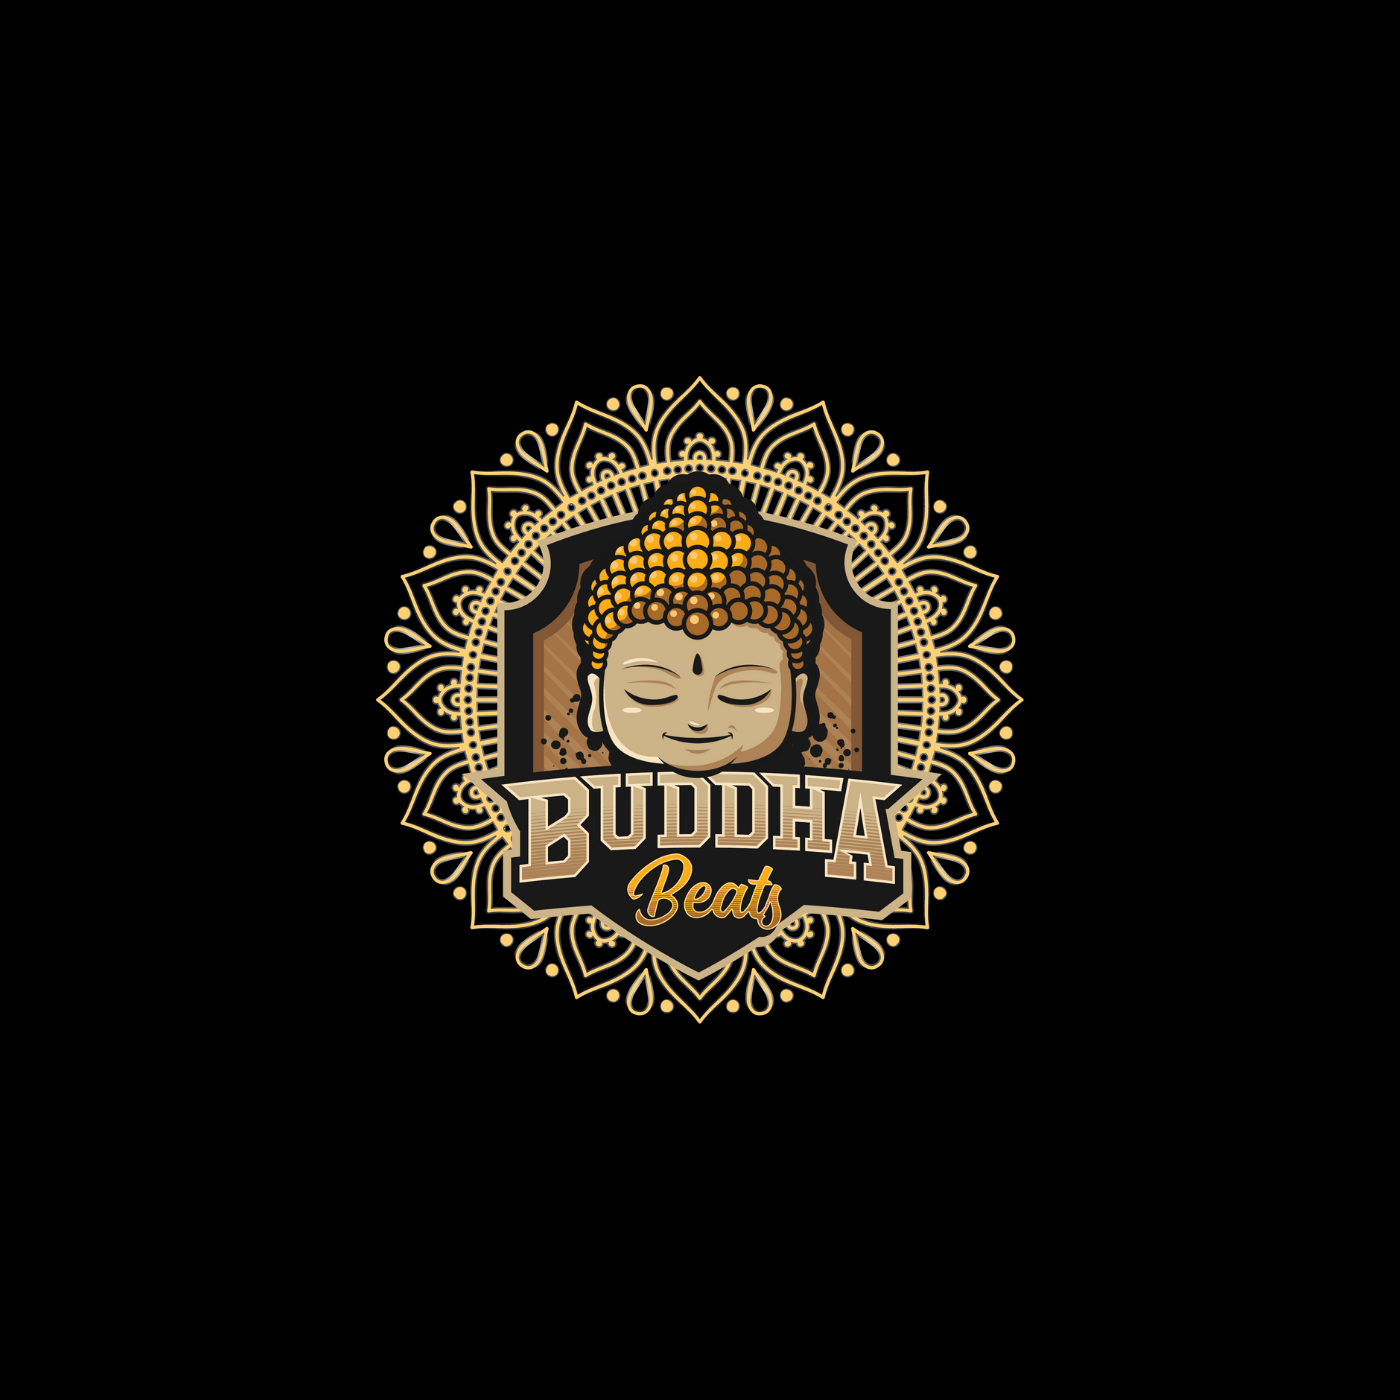 https://buddha-beats-online.myshopify.com/